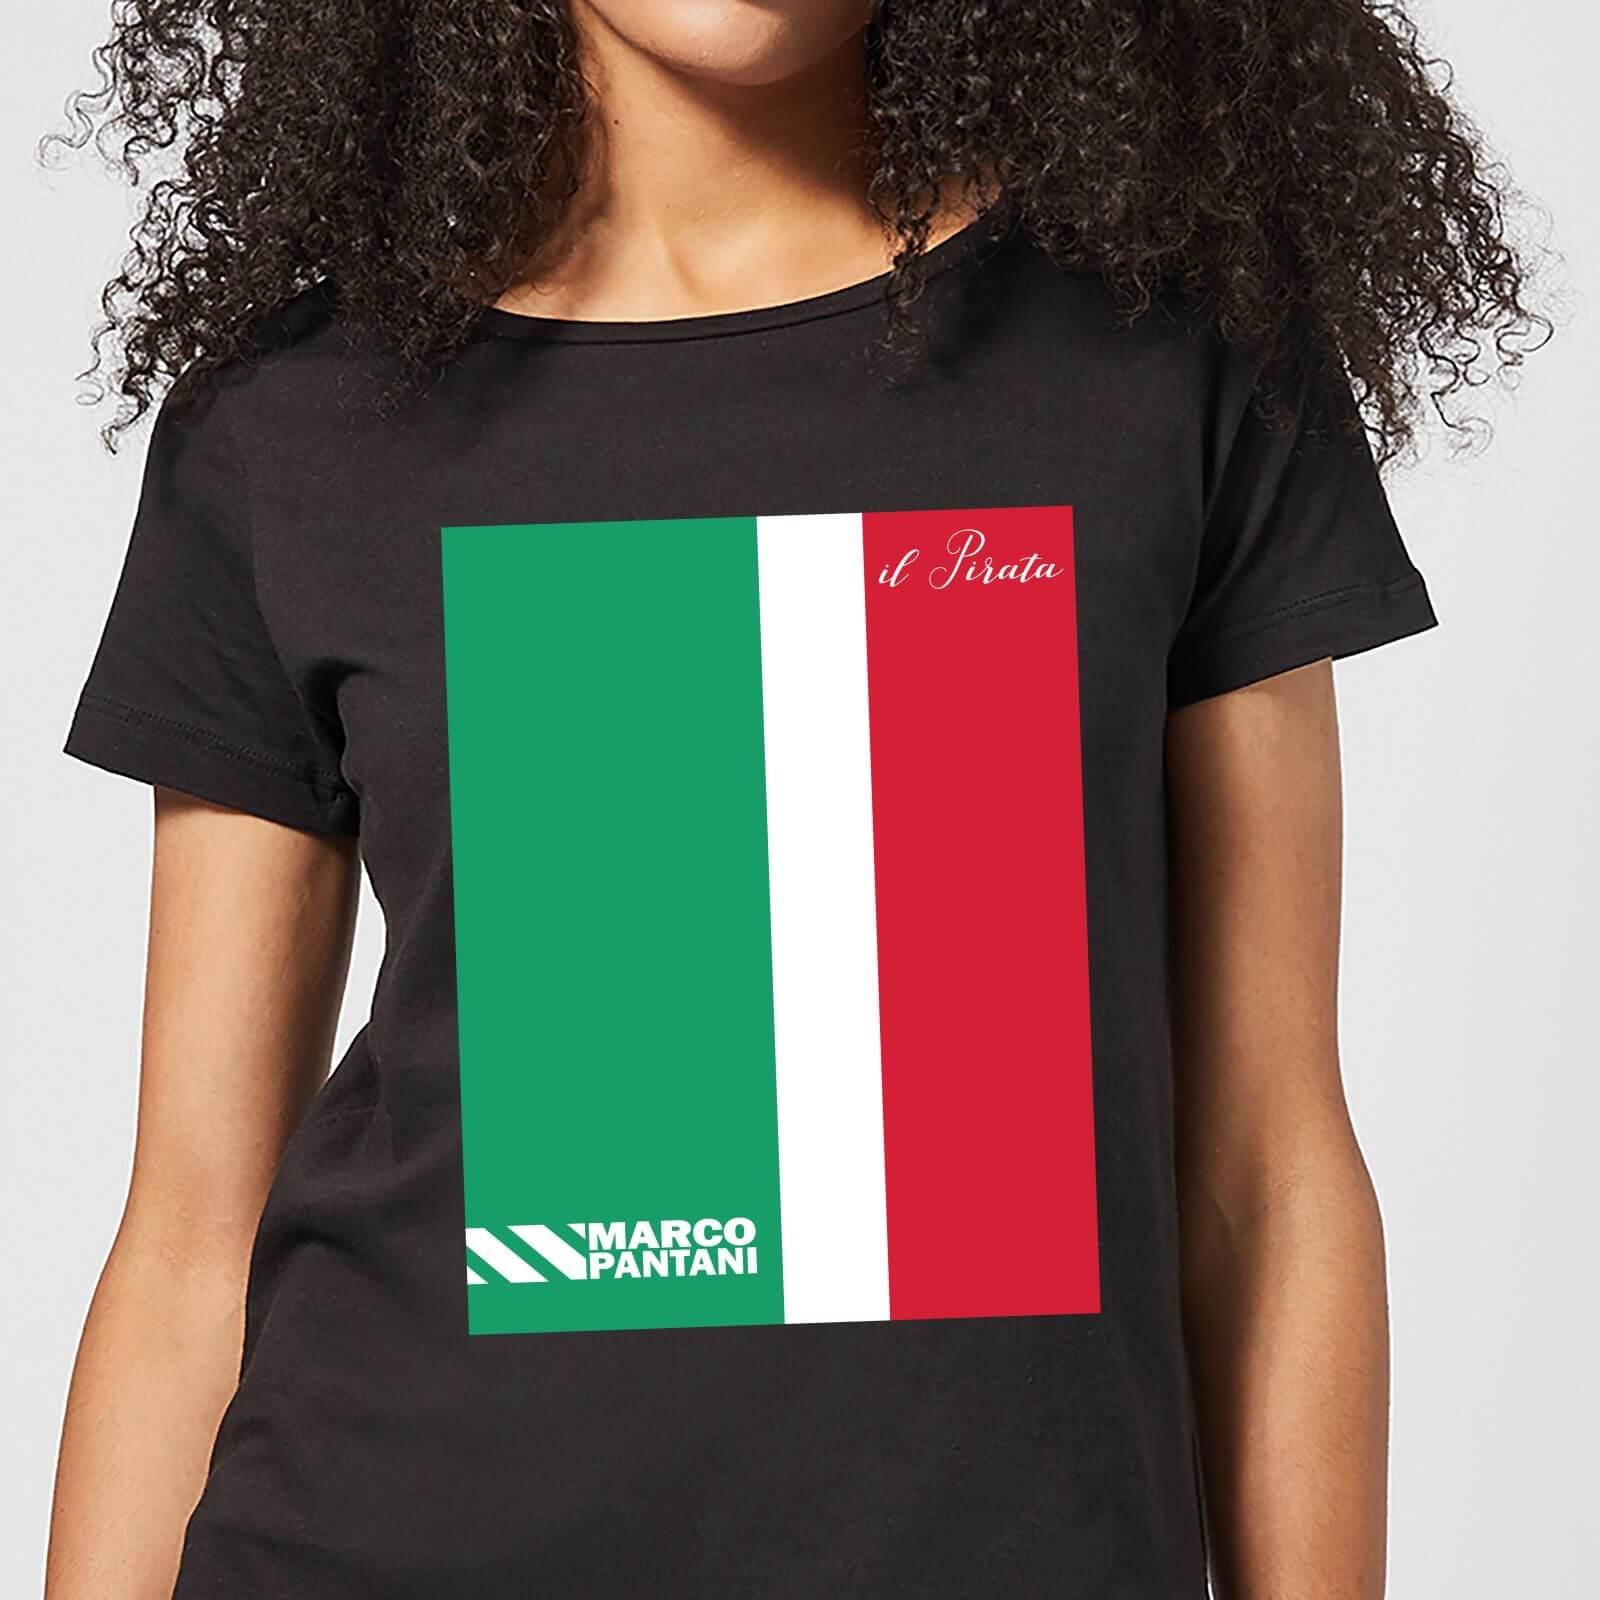 Summit Finish Pantani Il Pirata Women's T-Shirt - Black - M - Black